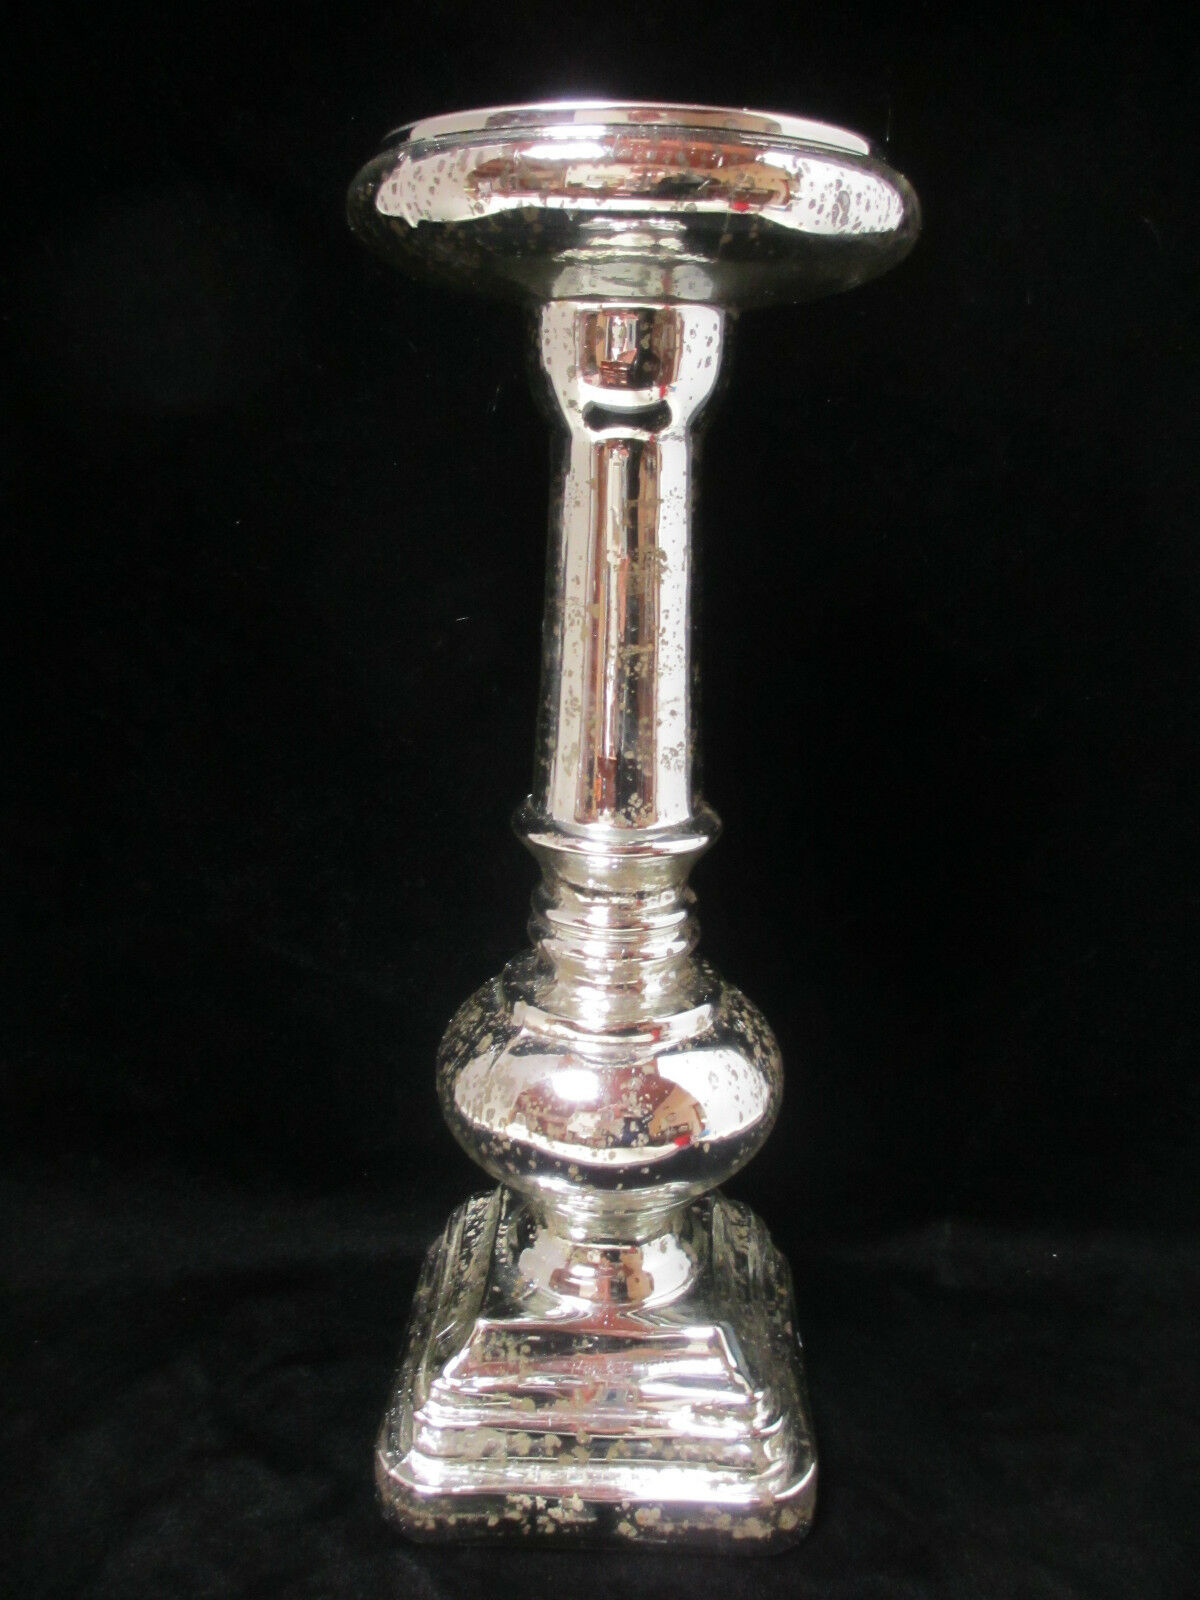 Pottery Barn Antique Mercury Glass Pillar Candle Holder 14 1 2  High Large NIB